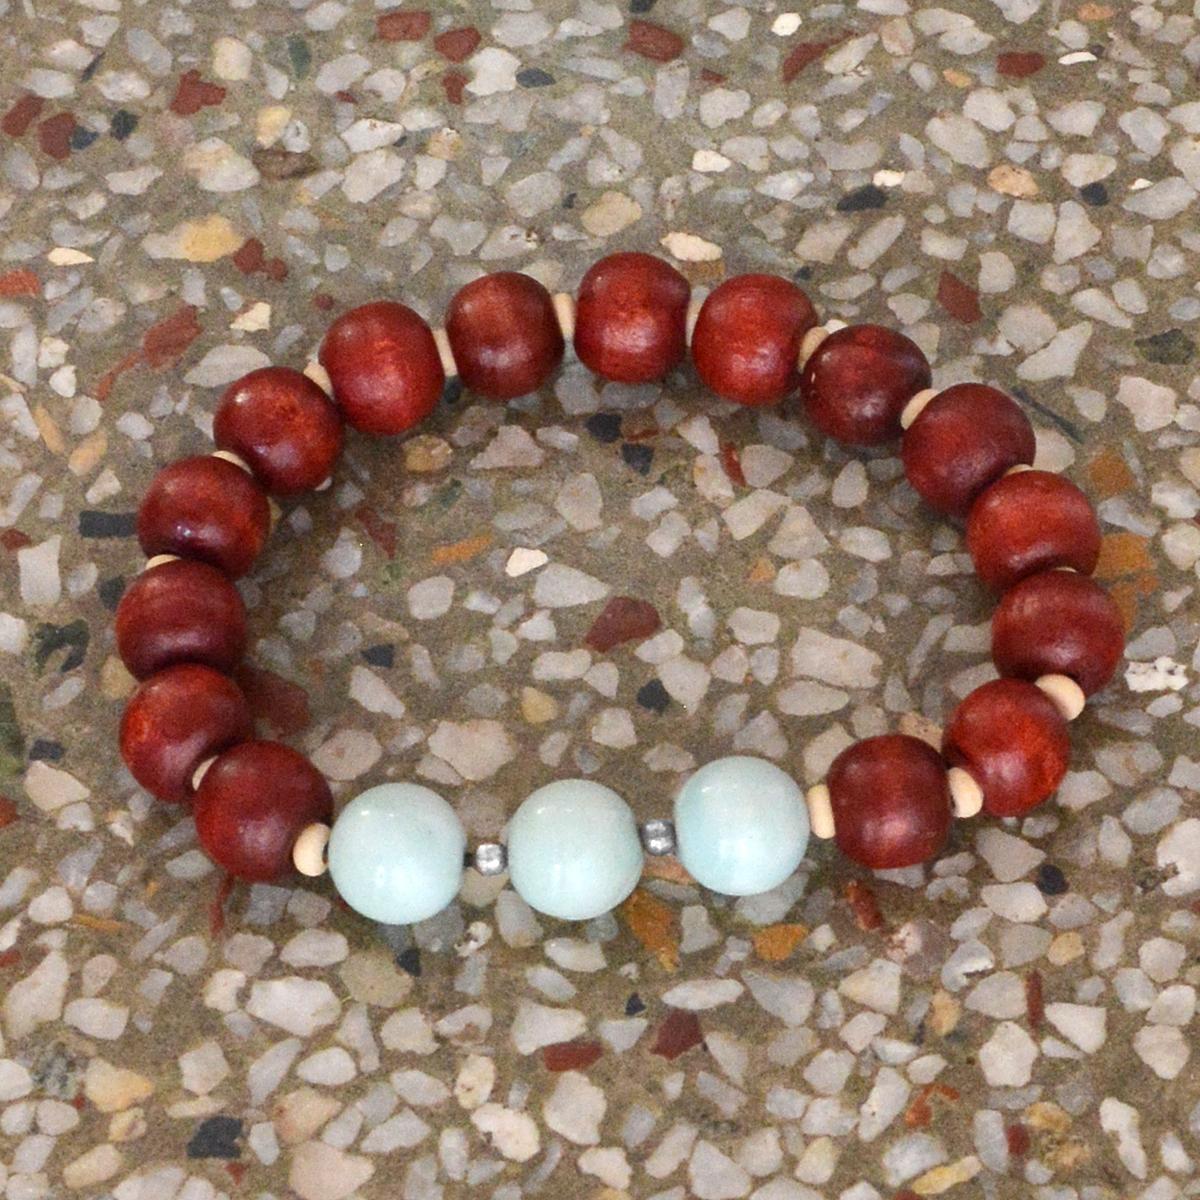 Handmade Manufacturer Essential Oil Diffuser Yoga-Meditation Bracelet, Jaipur Rajasthan India Sterling Silver, Amazonite Beads